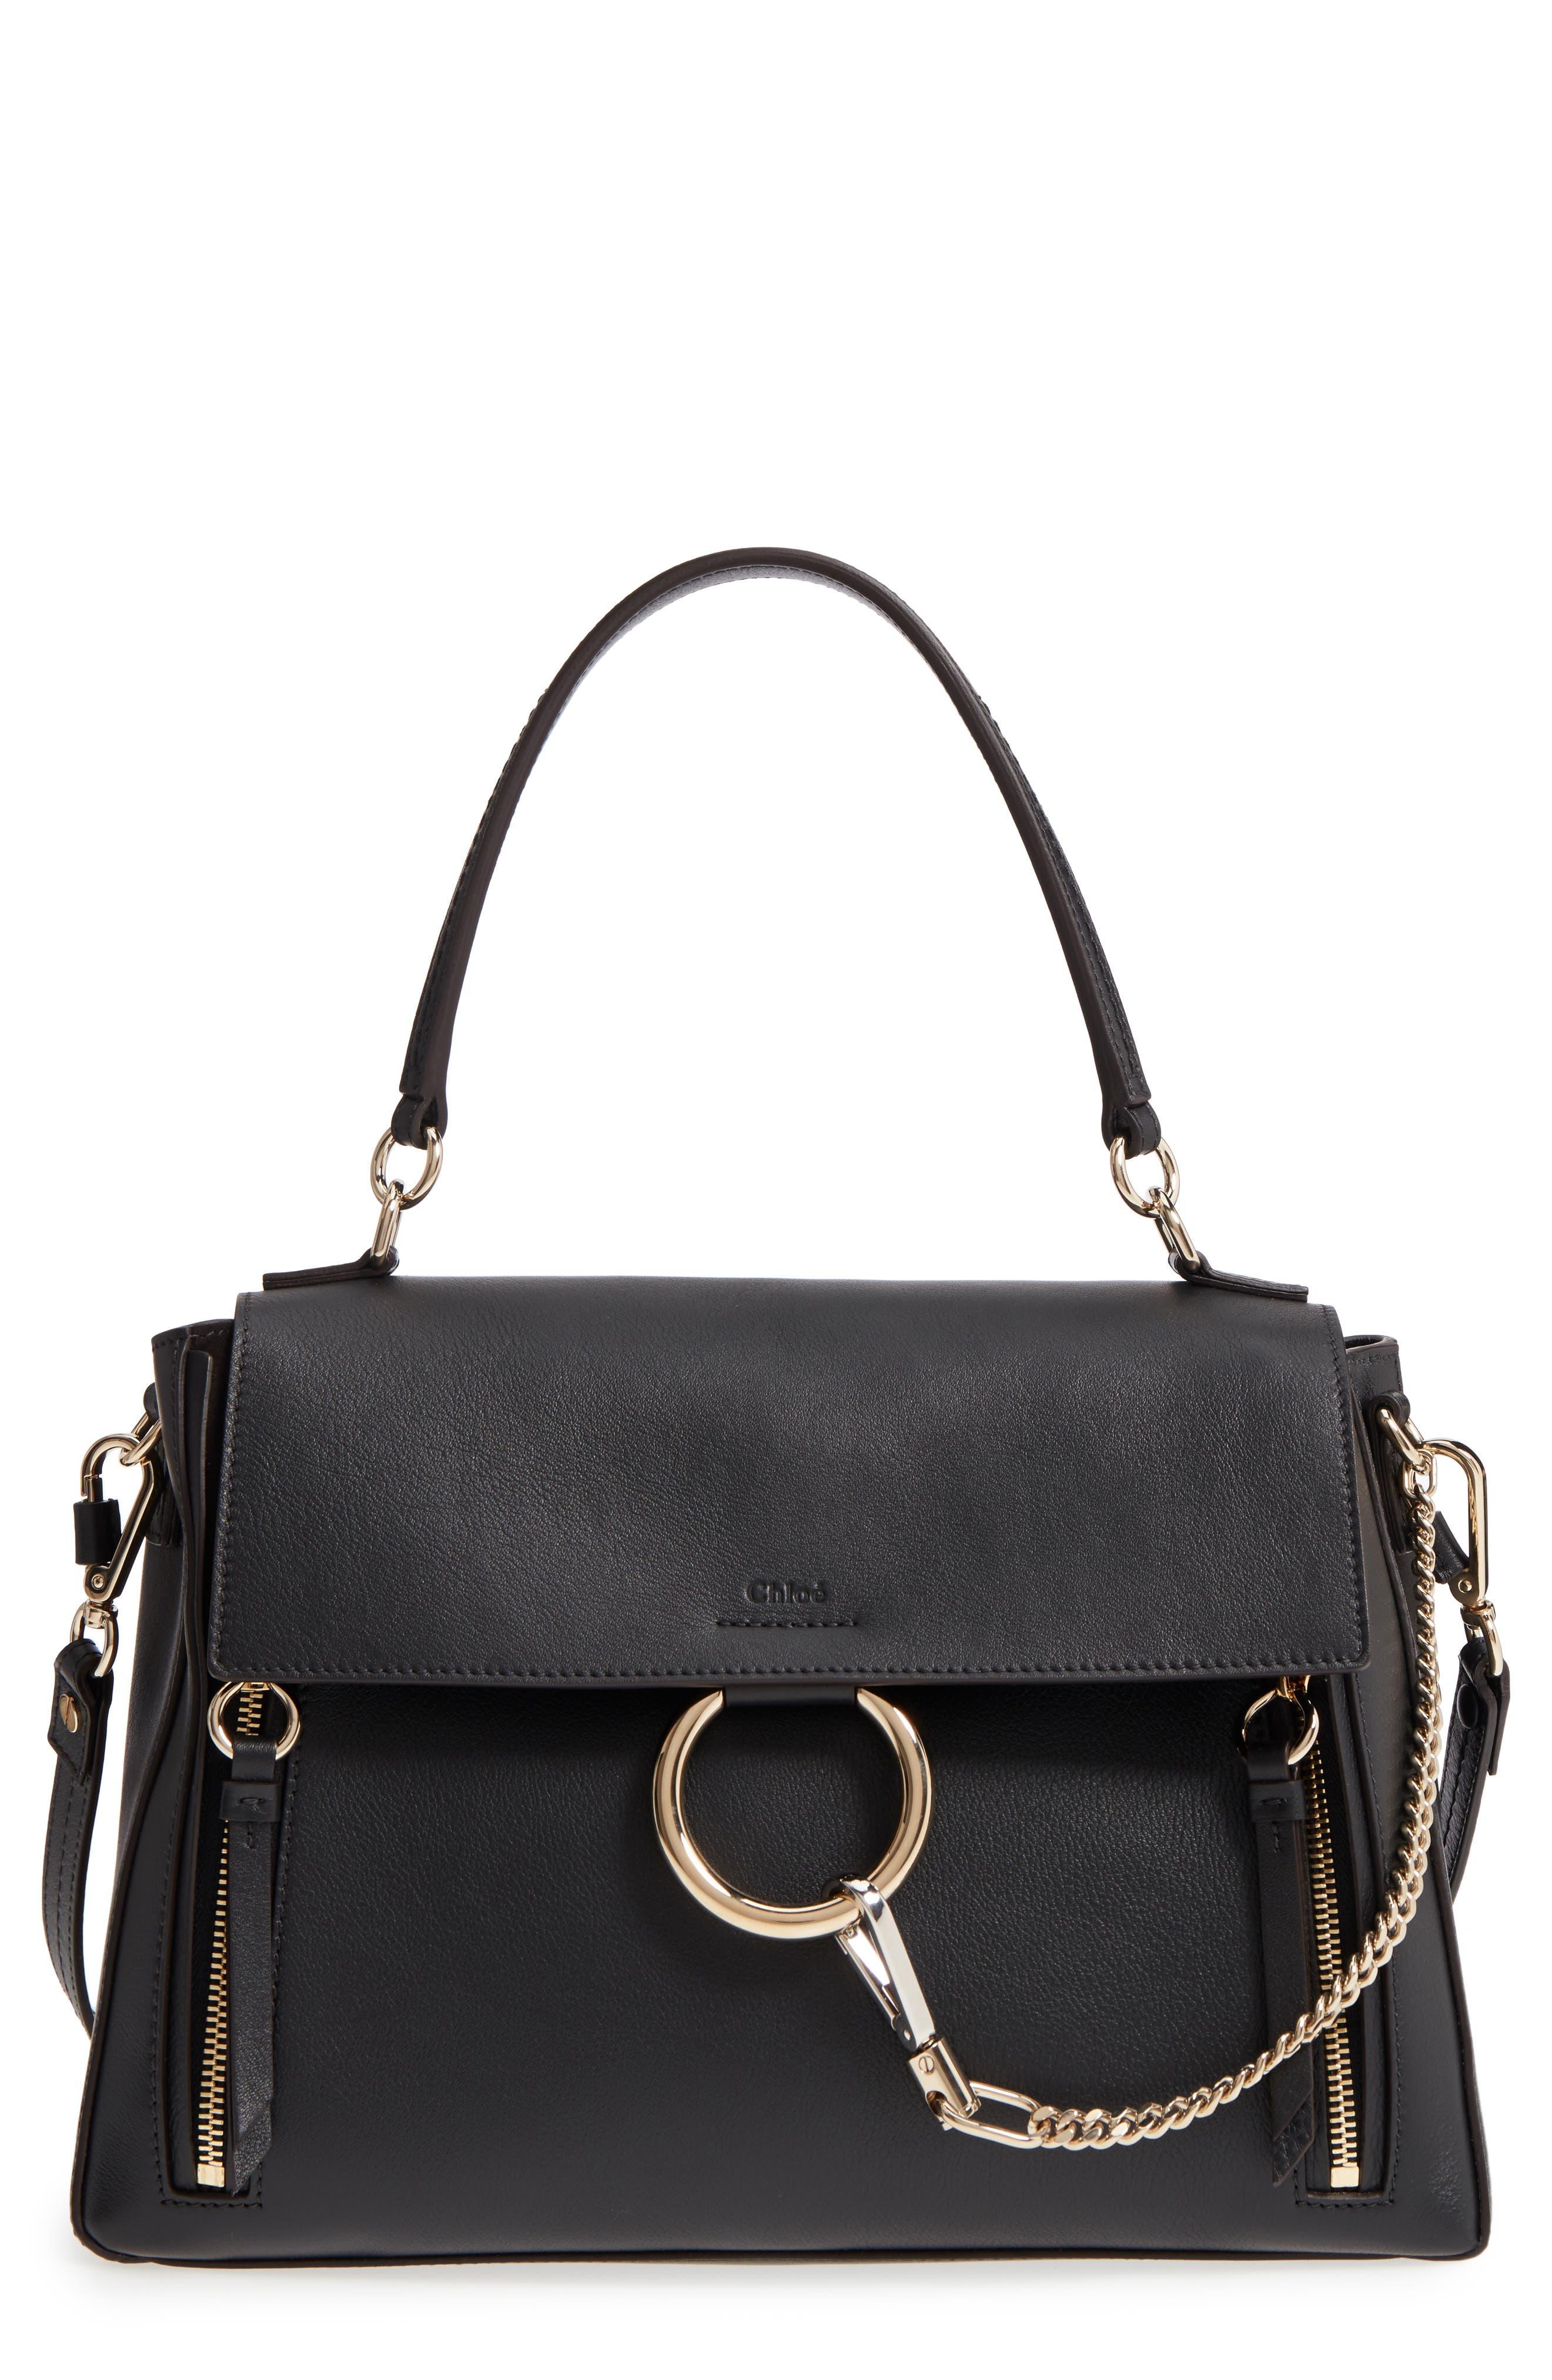 Medium Faye Leather Shoulder Bag,                             Main thumbnail 1, color,                             BLACK